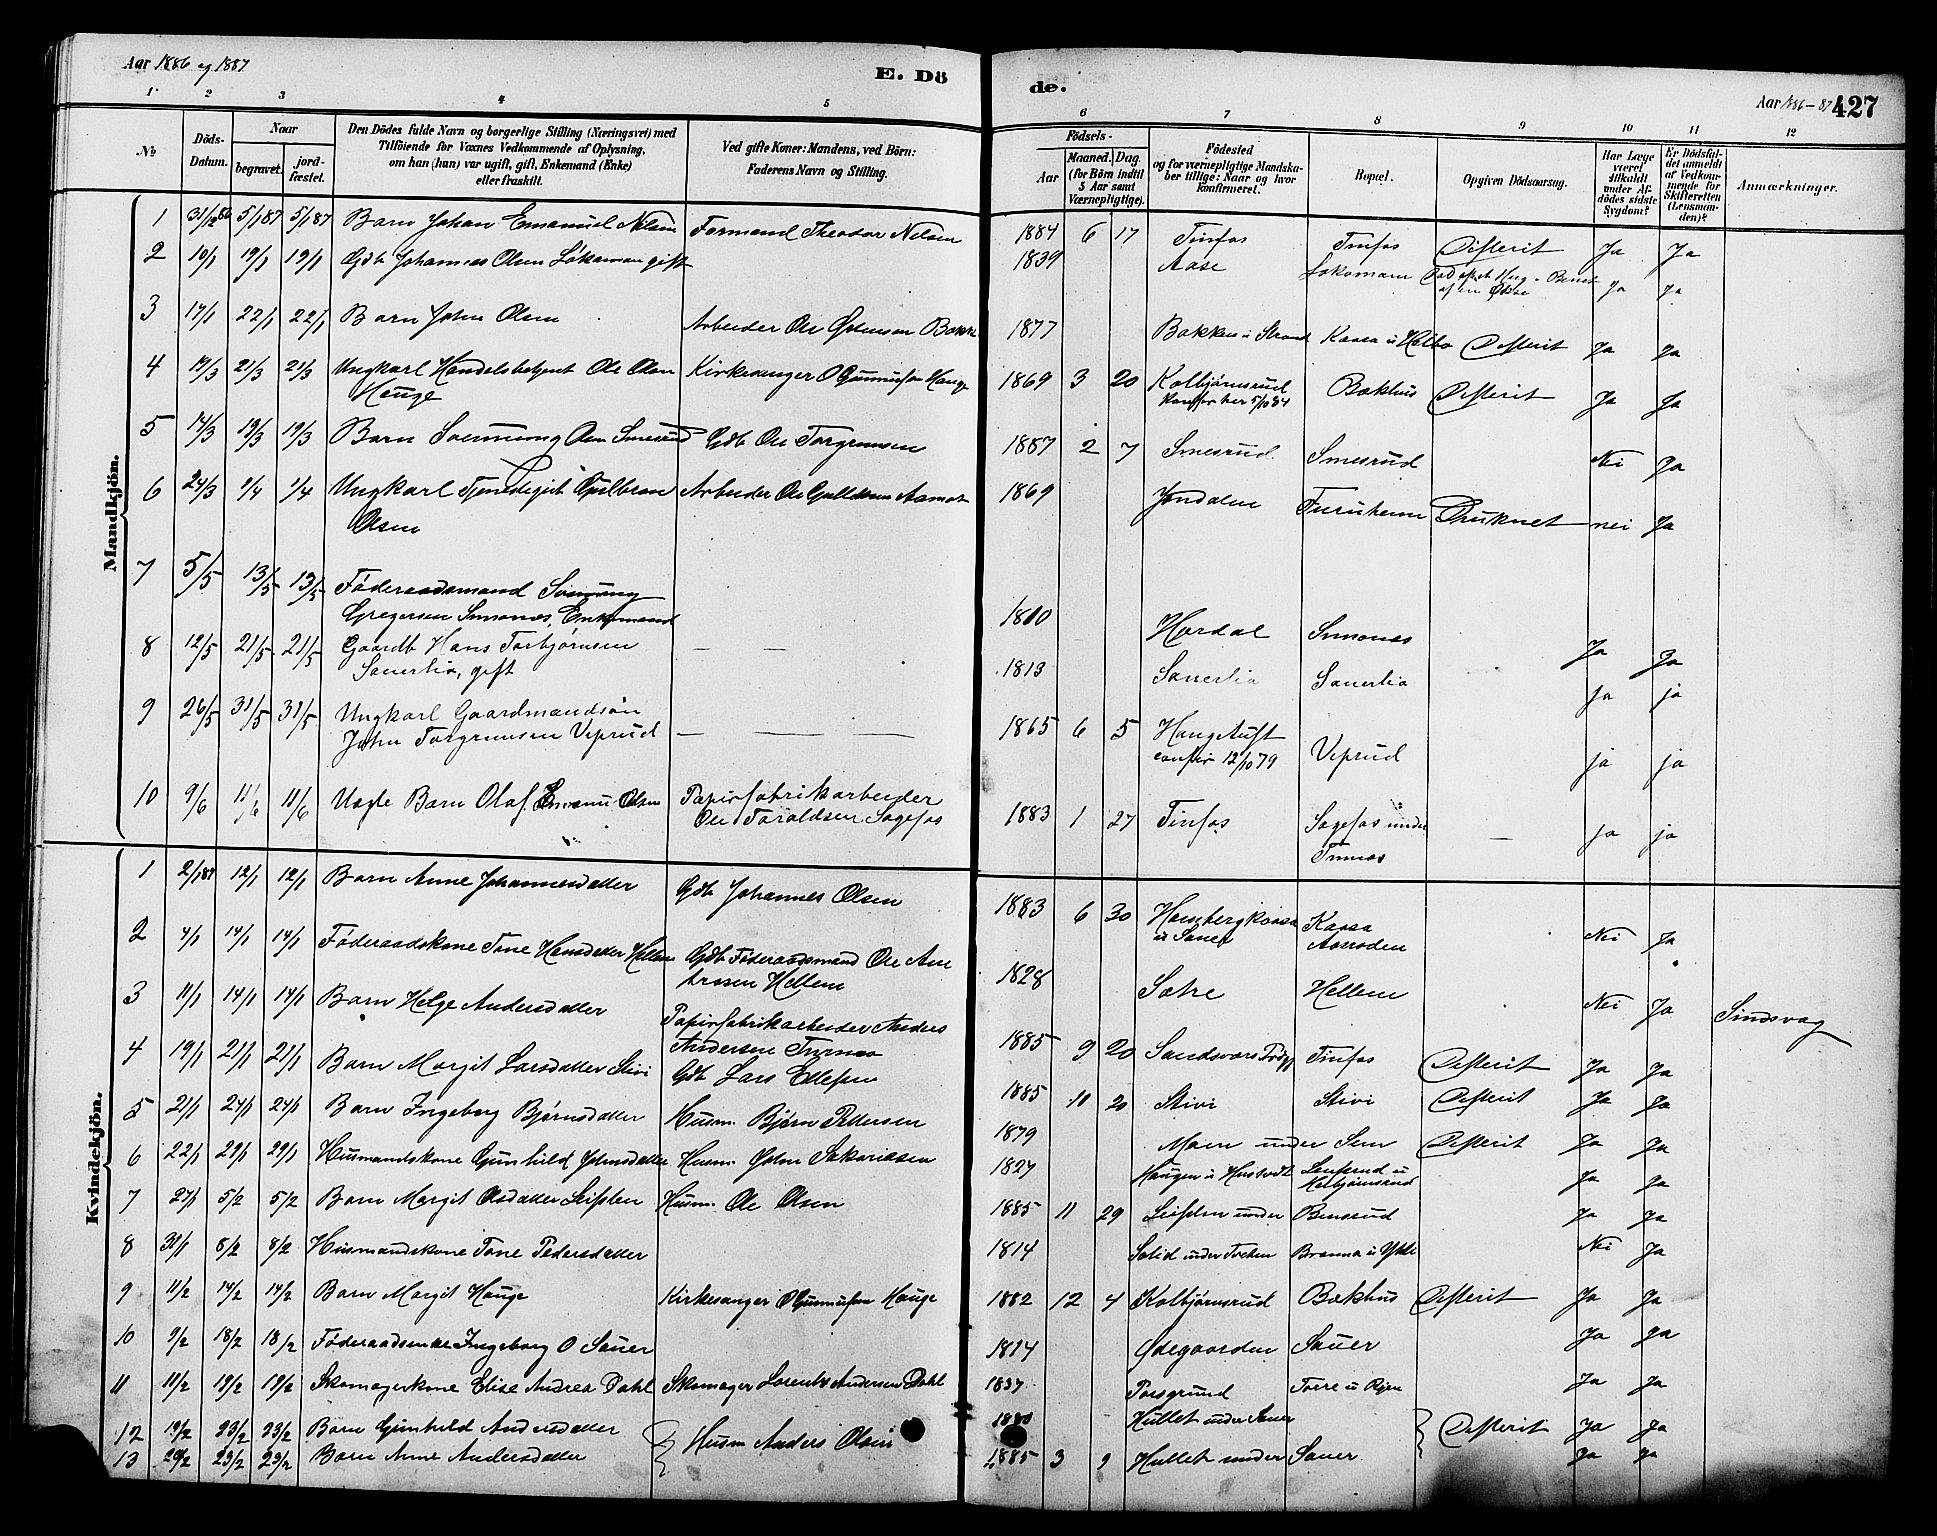 SAKO, Heddal kirkebøker, G/Ga/L0002: Klokkerbok nr. I 2, 1879-1908, s. 427